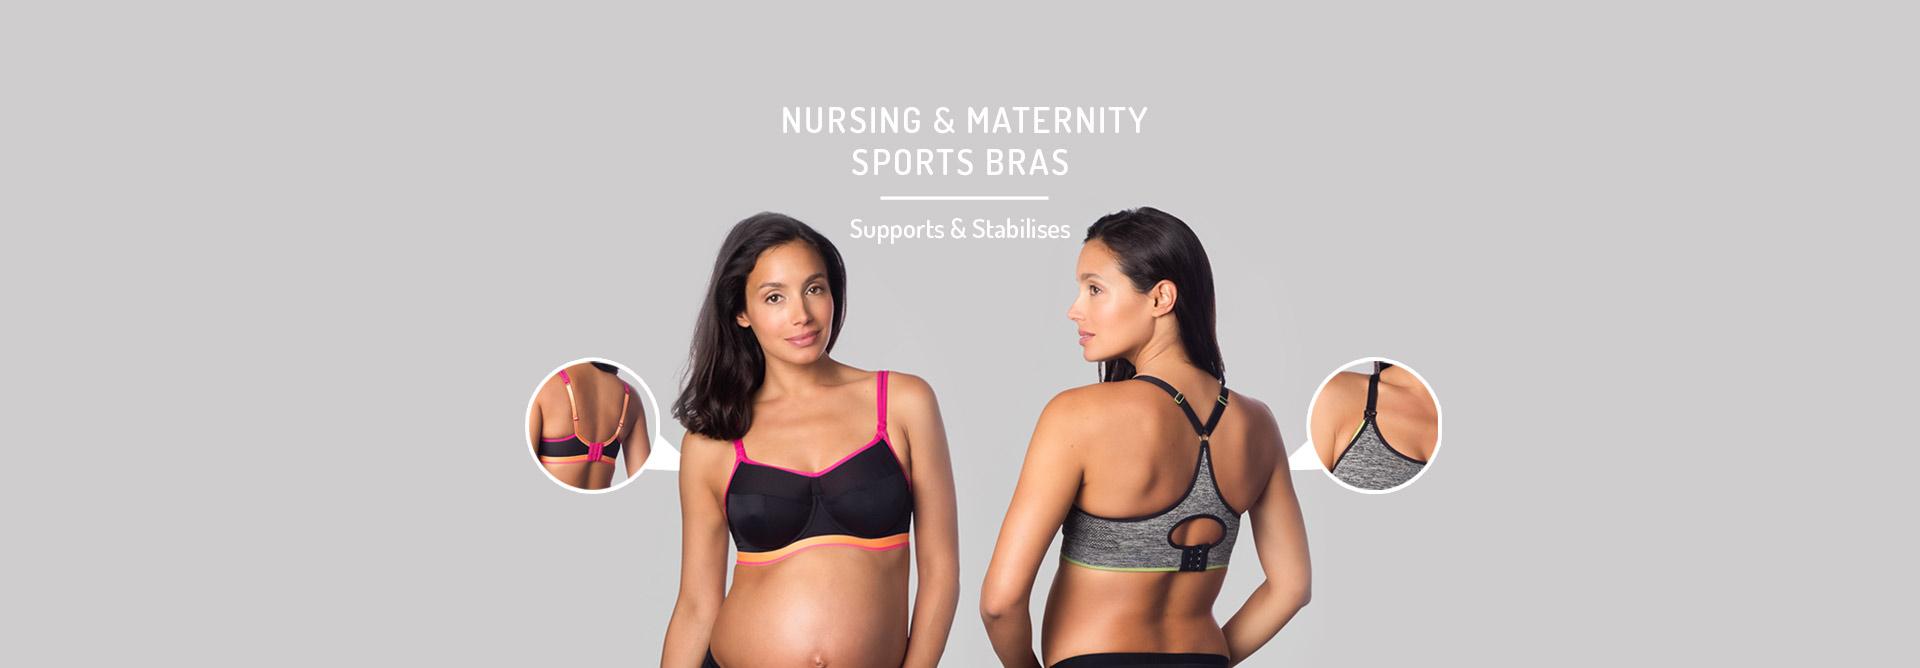 ..Nursery & Maternity Sports Bras